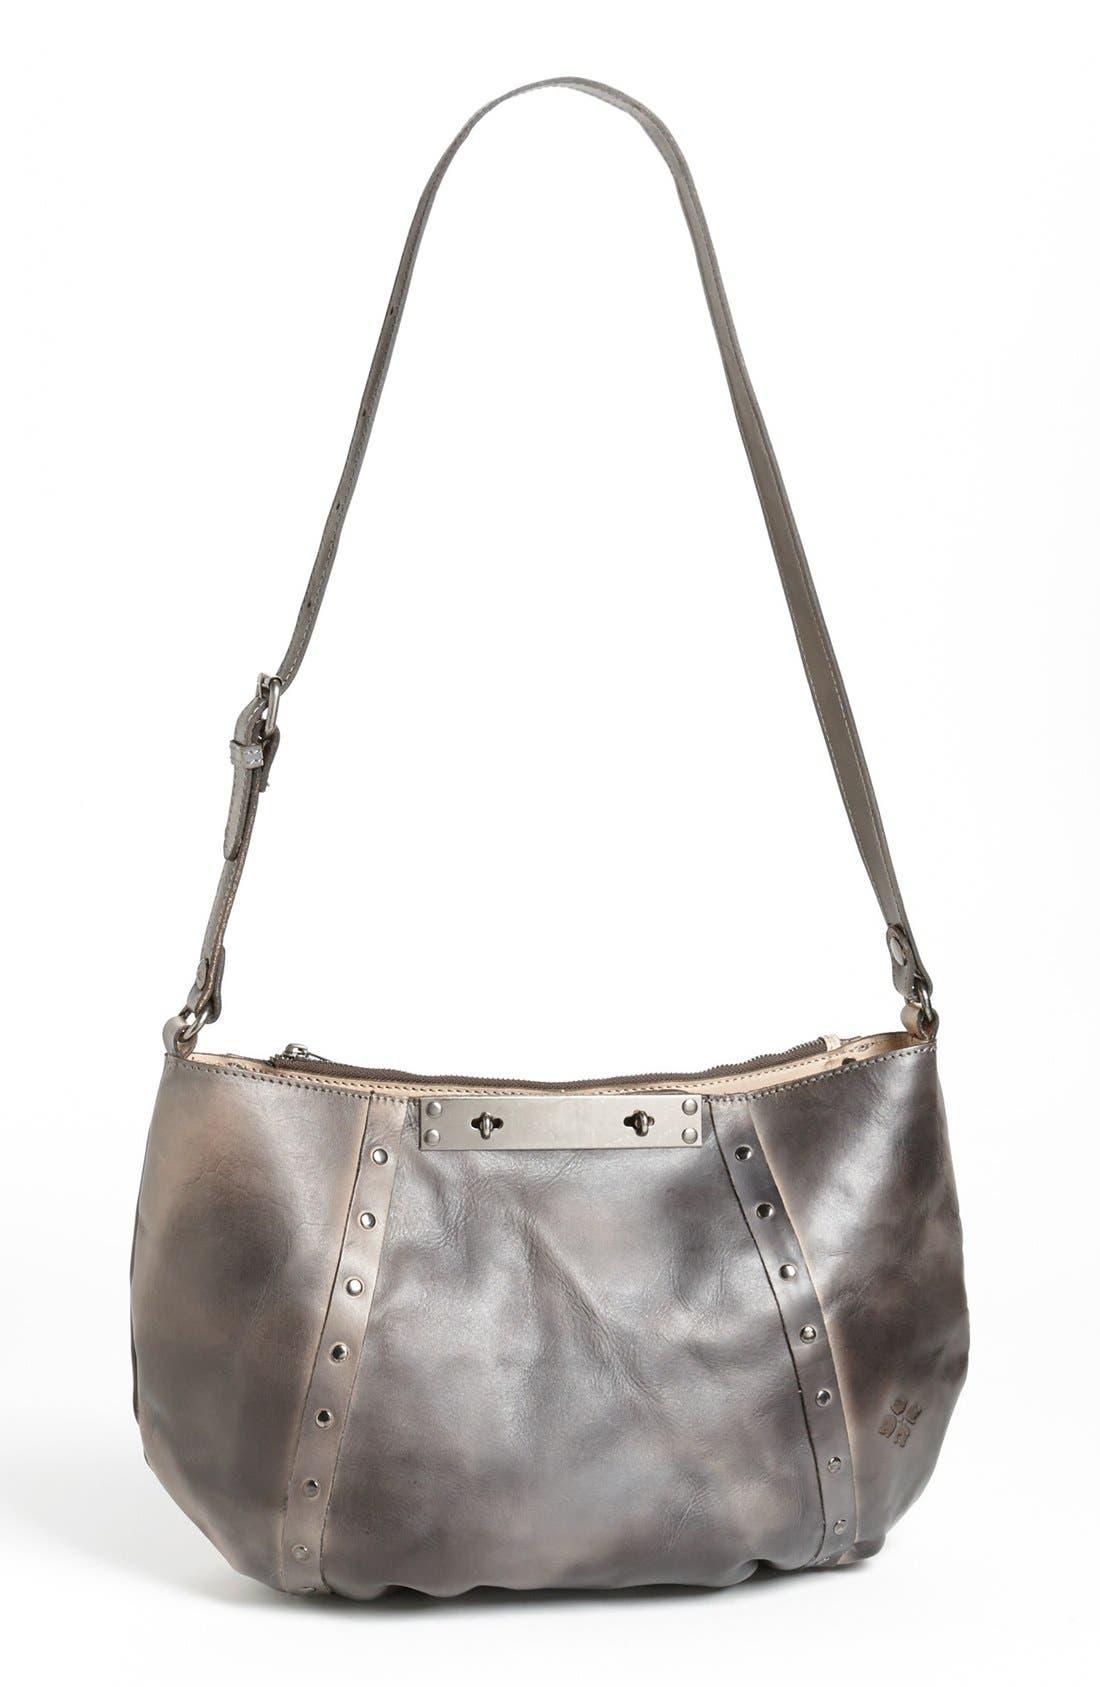 Main Image - Patricia Nash 'Bucciano' Leather Shoulder Bag